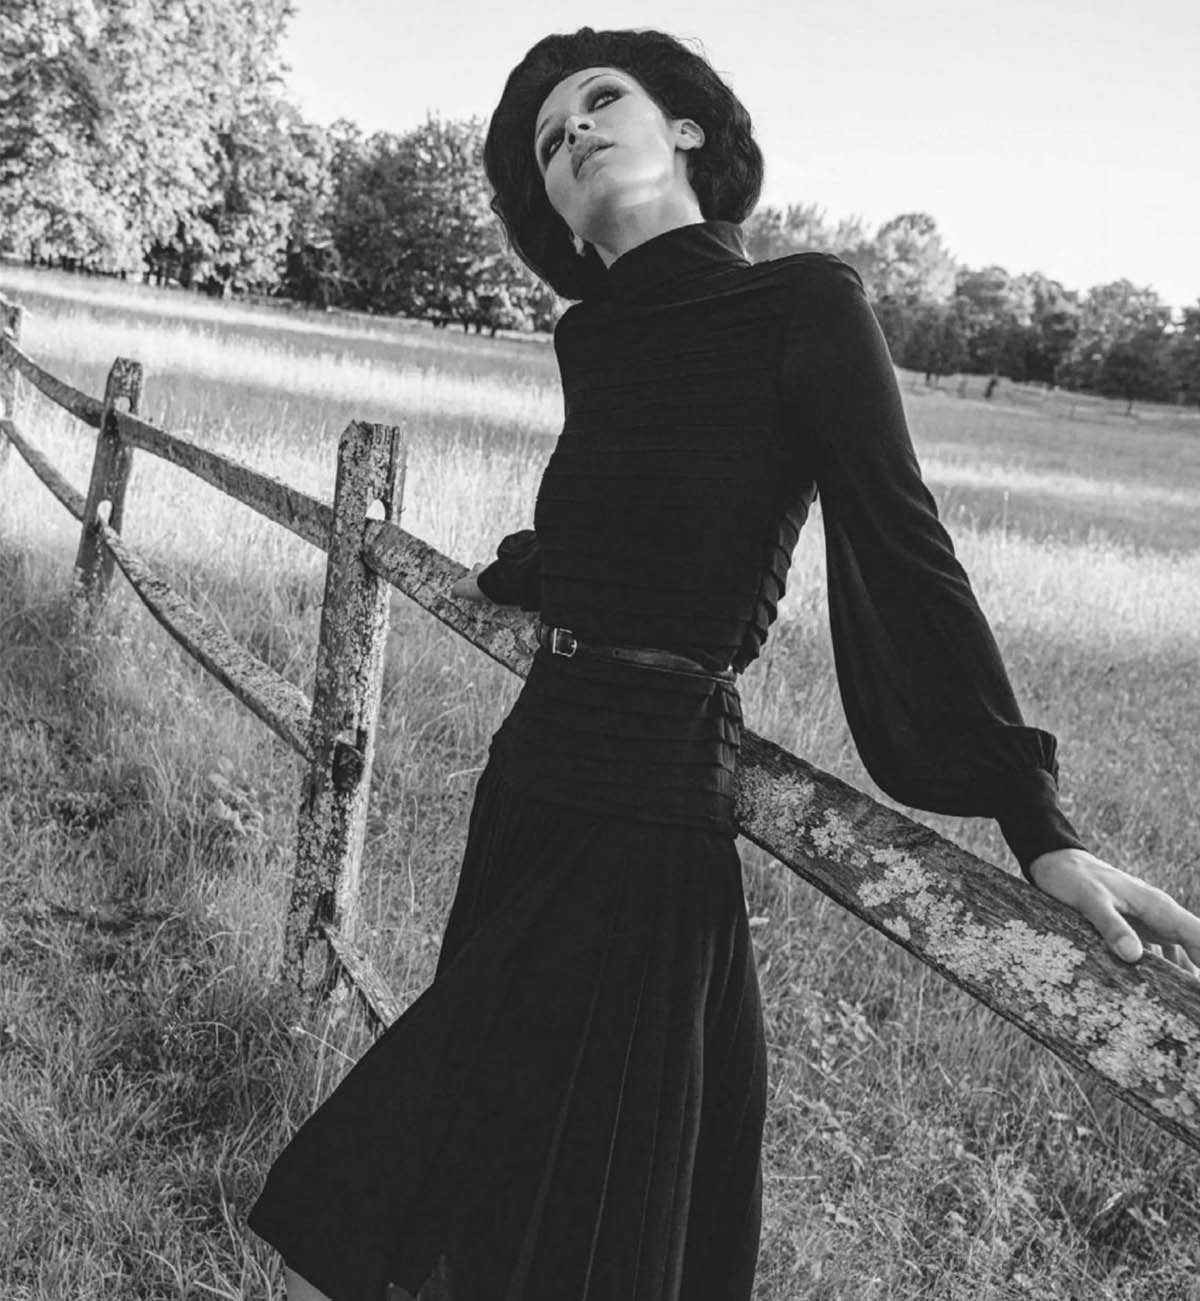 Bella Hadid by Inez and Vinoodh for British Vogue January 2021